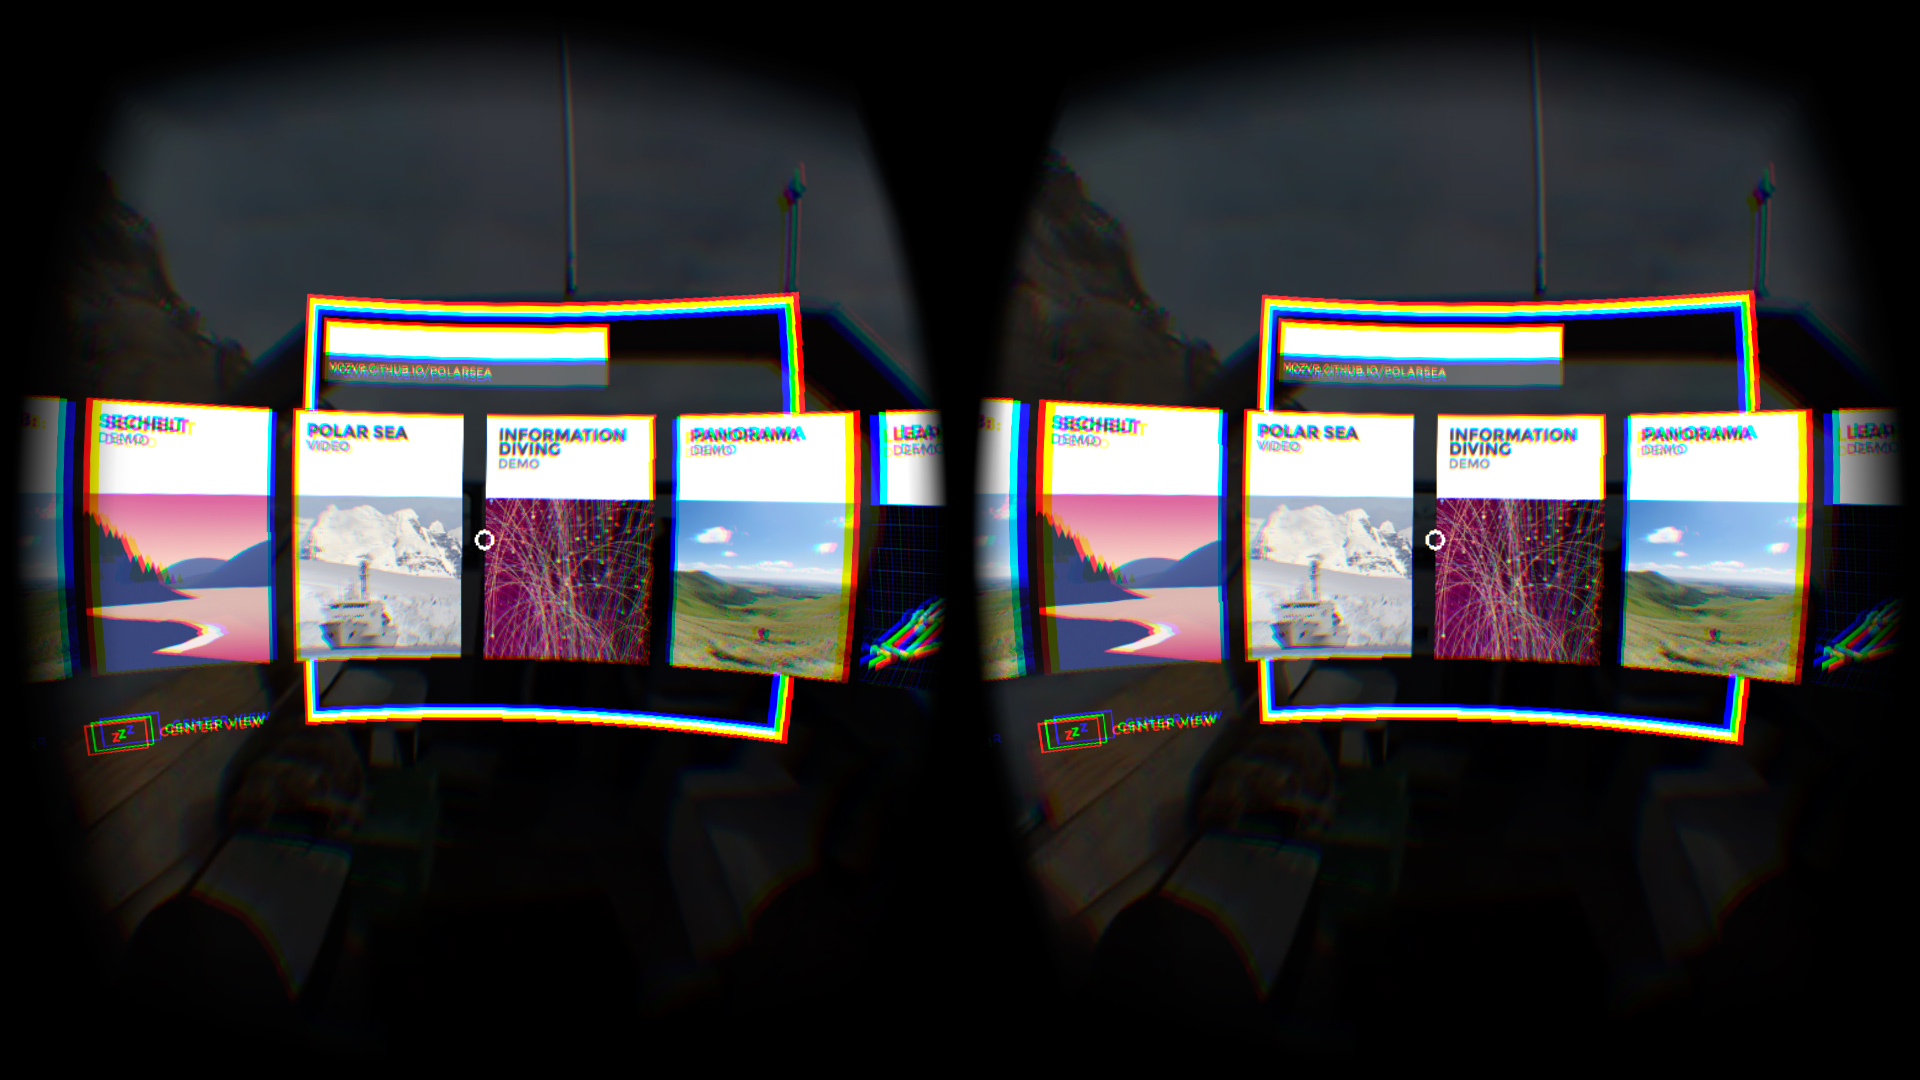 virtual reality and web based manuals